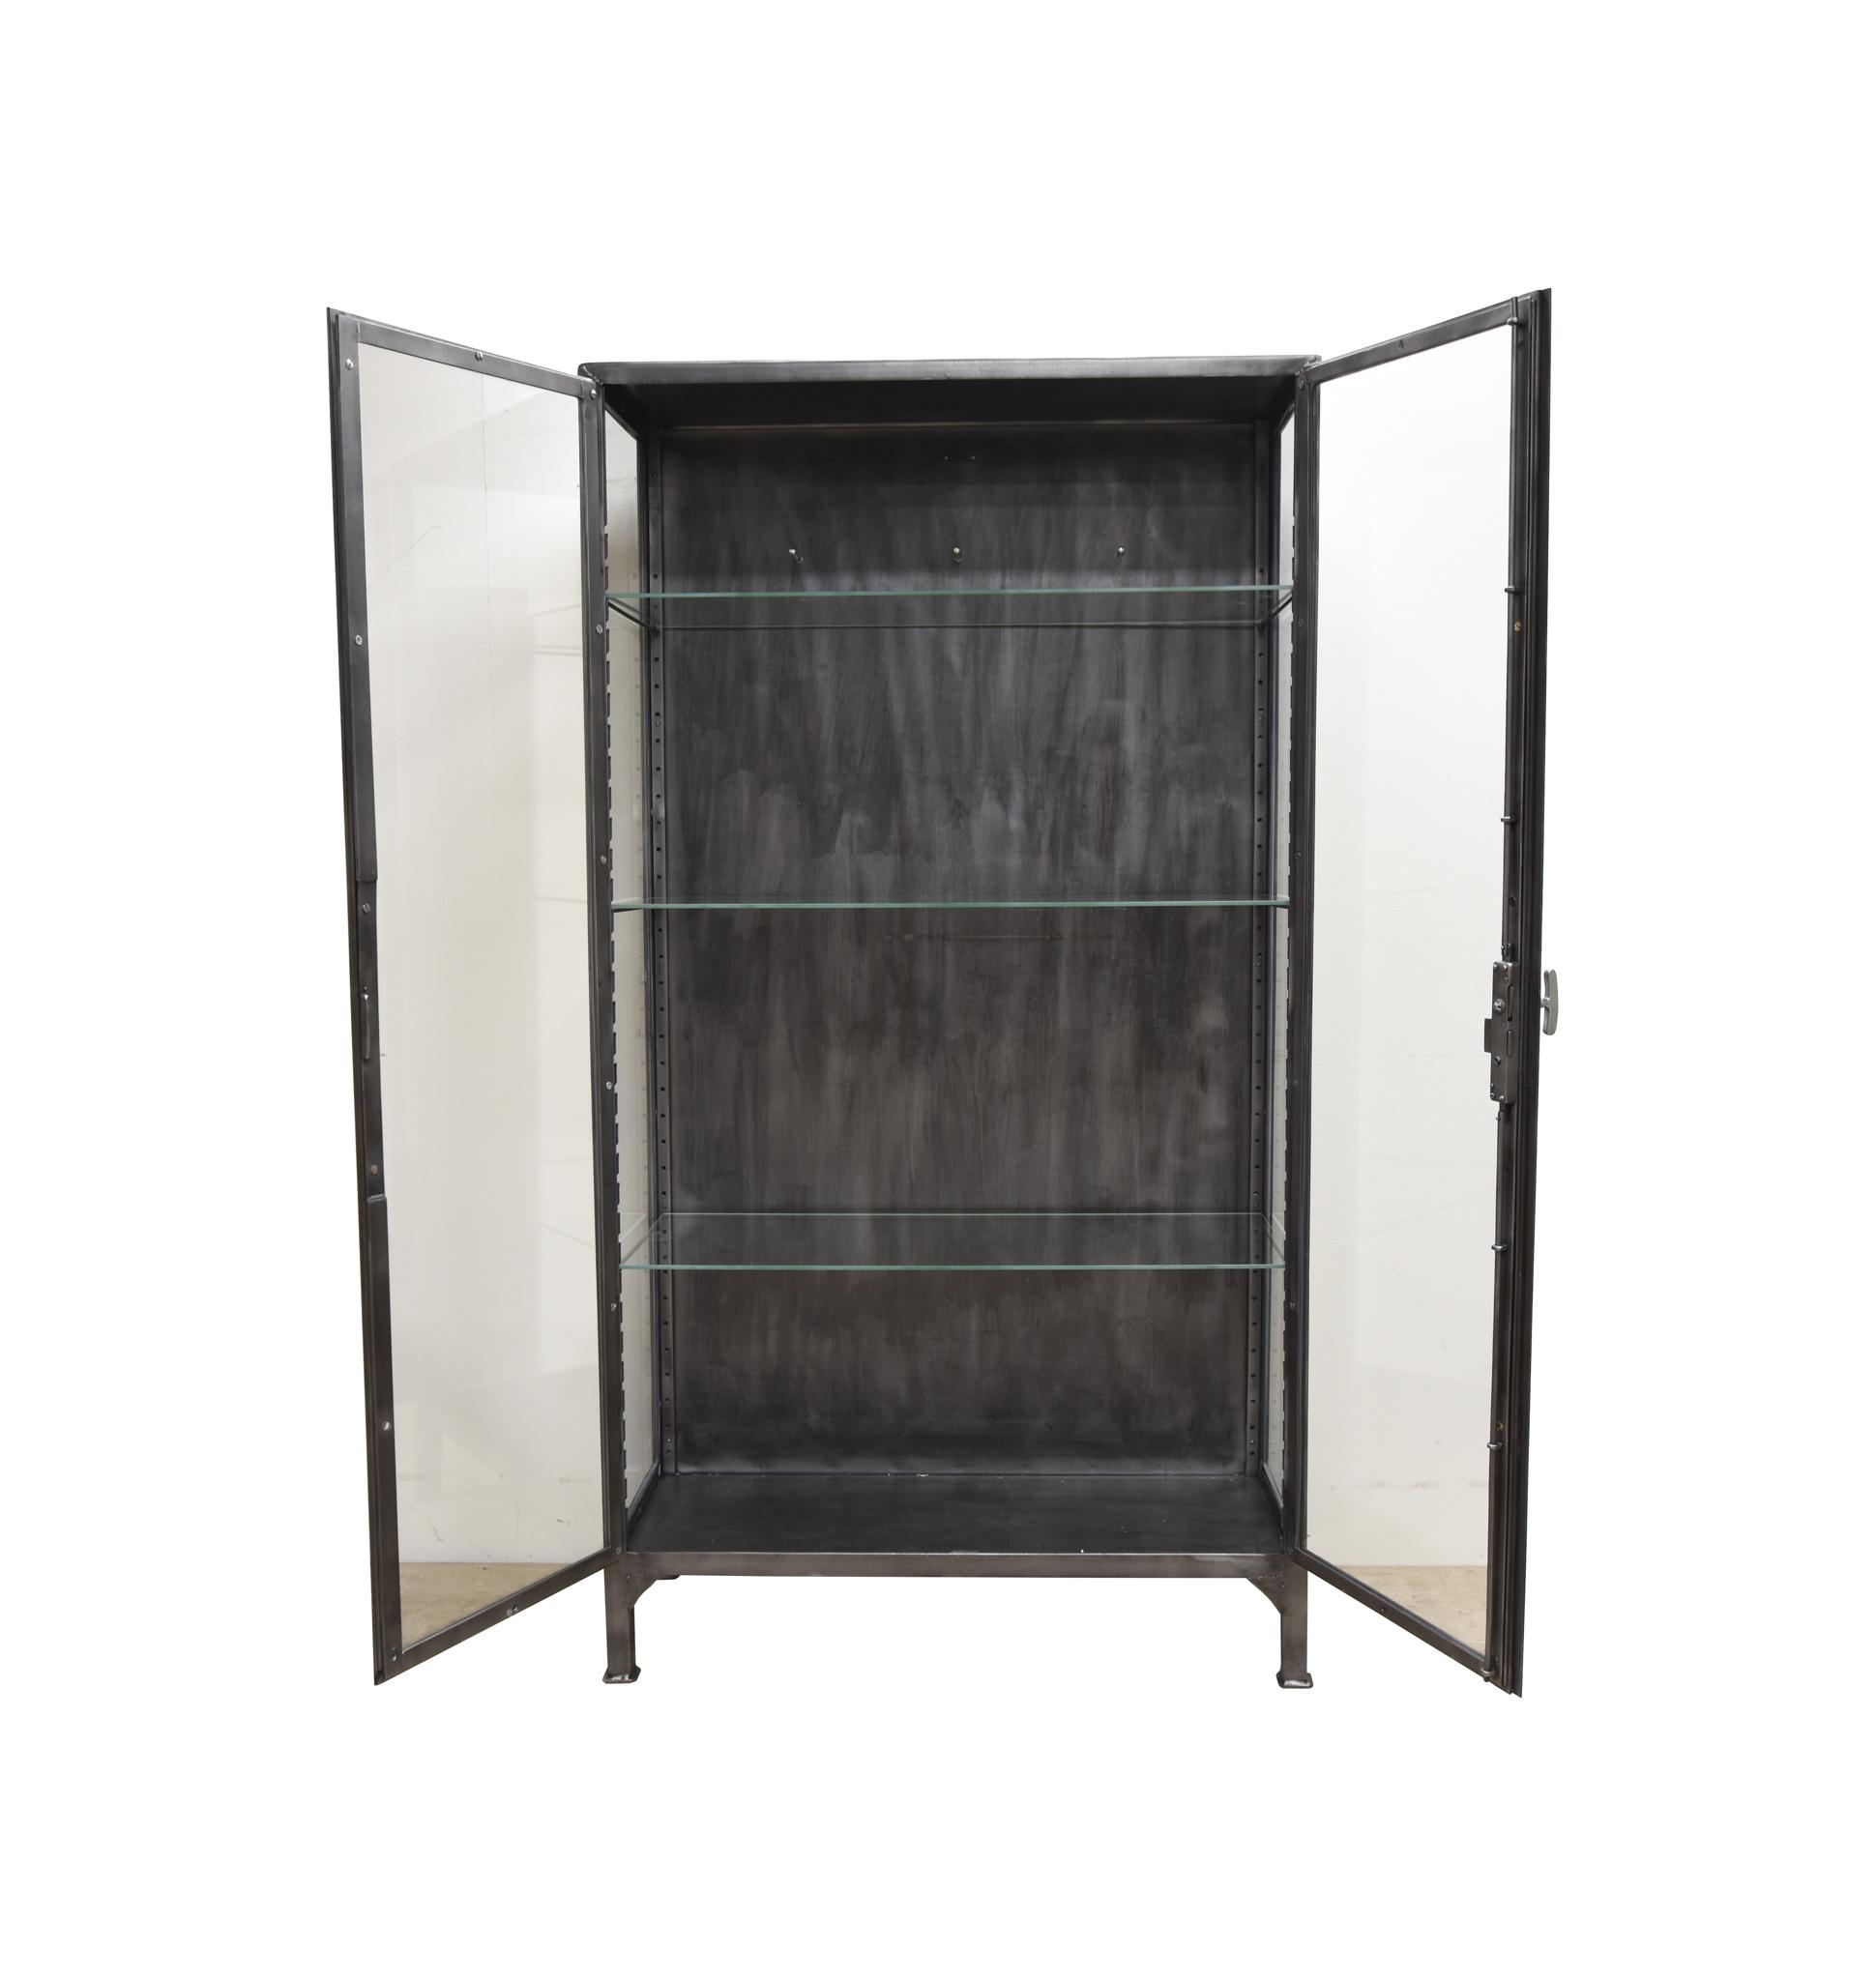 Robuuste metalen vitrine / medicijnkast